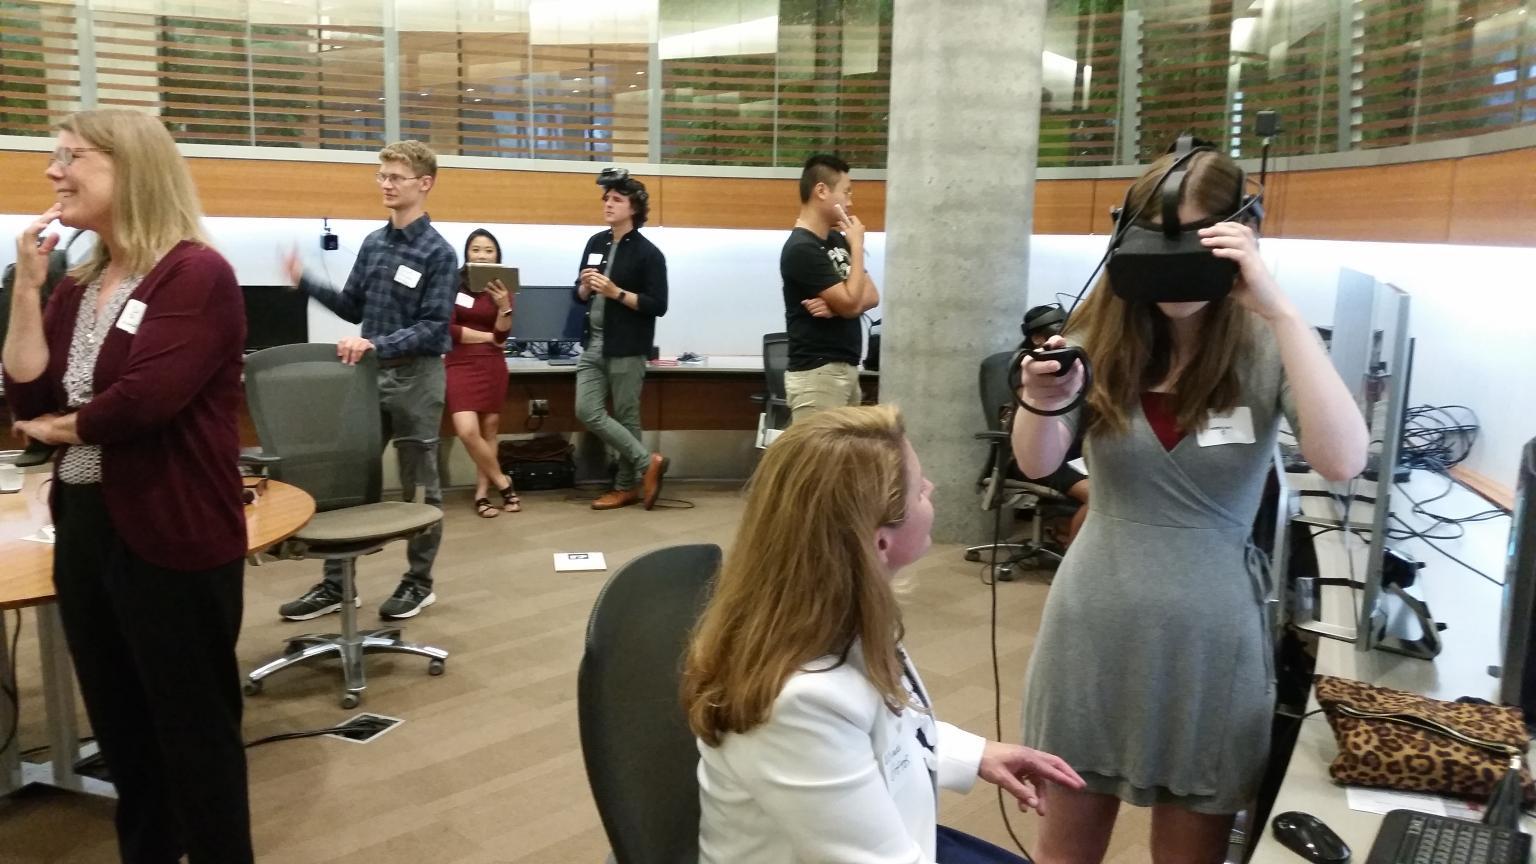 Virtual Realty at UW Madison